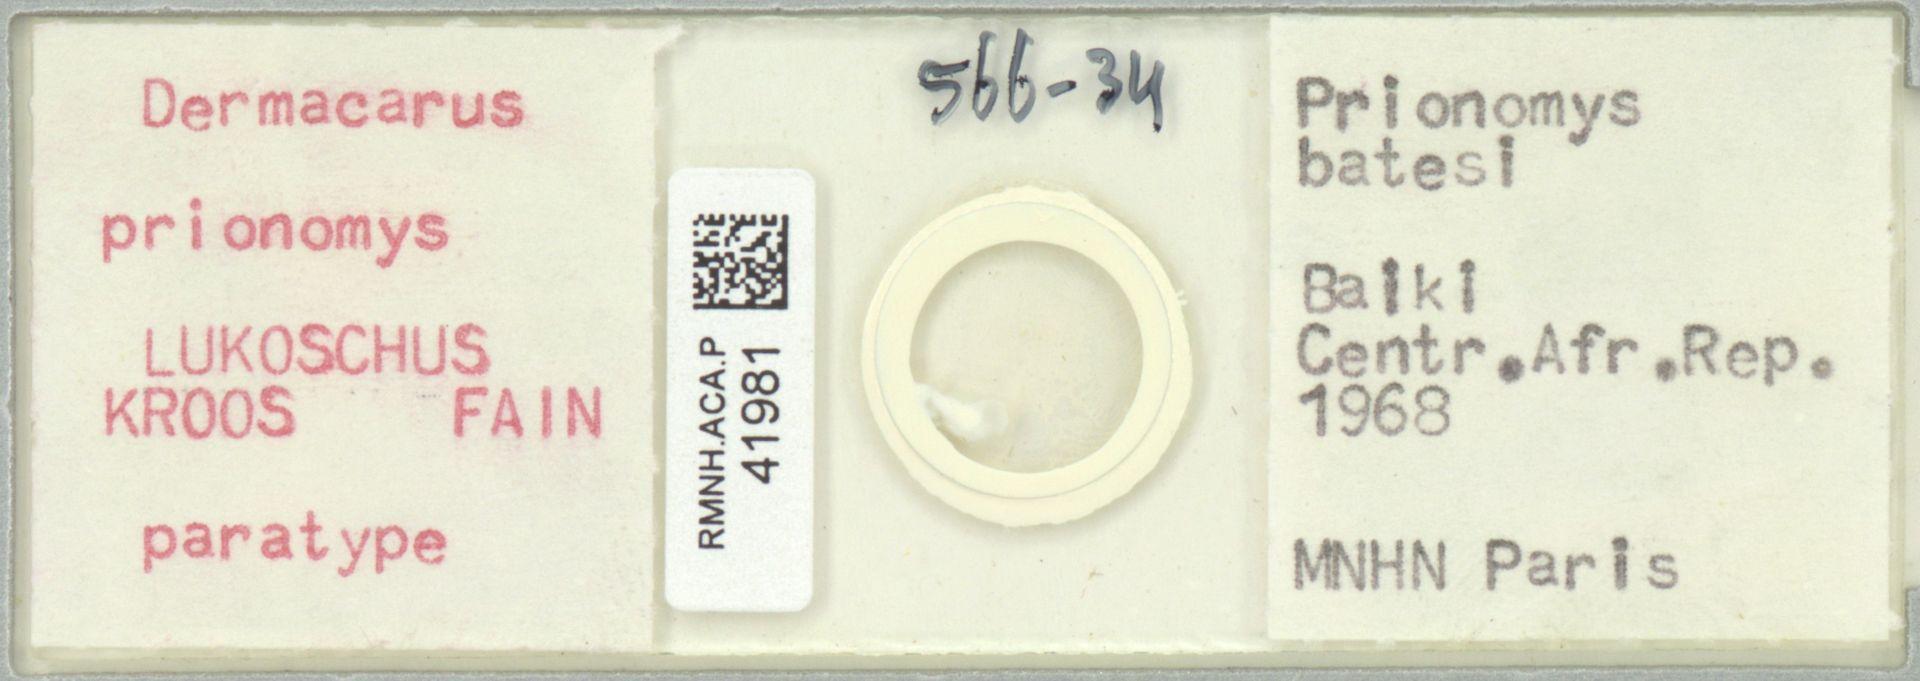 RMNH.ACA.P.41981 | Dermacarus prionomys Lukoschus, Kroos, Fain